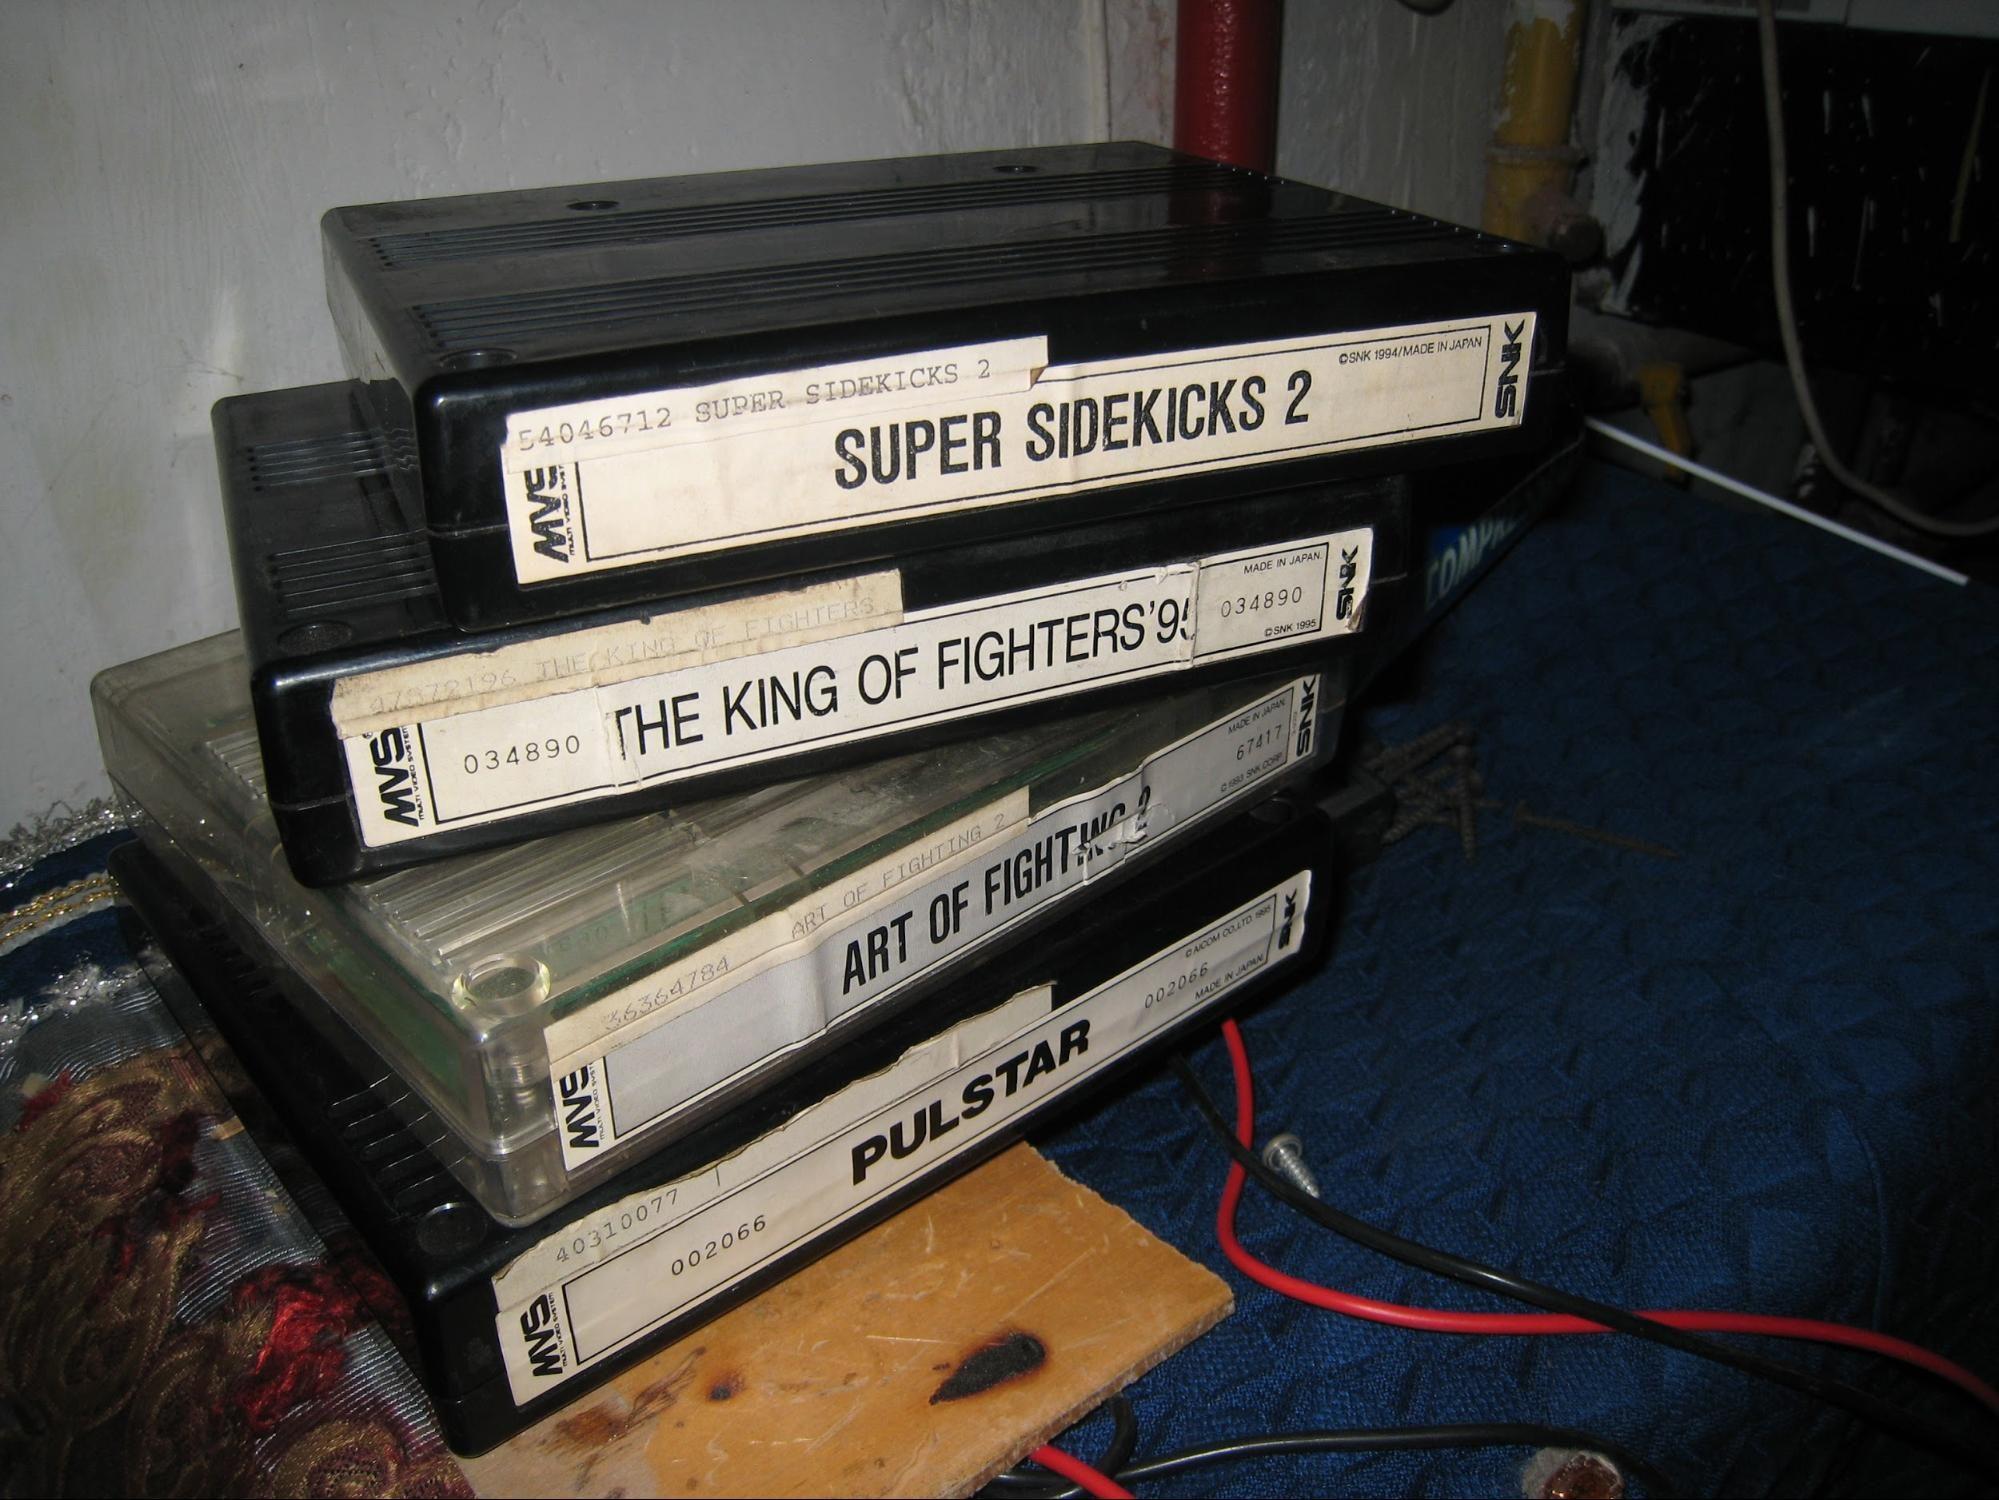 25 Video Game Cartridges, Ranked | Motherboard